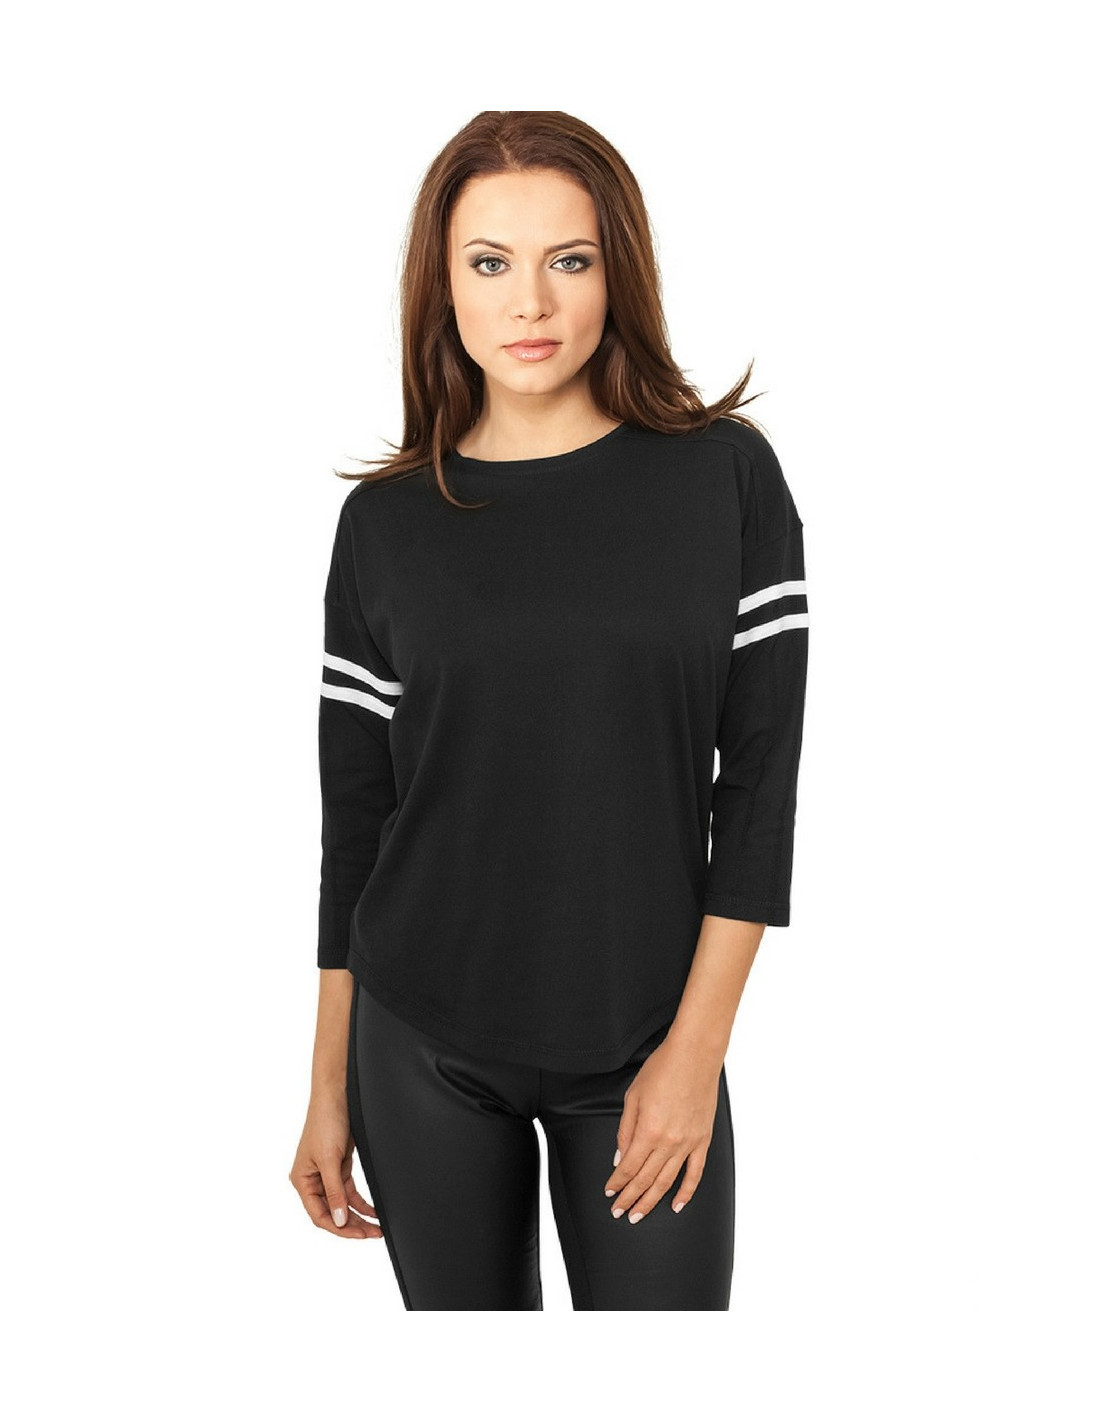 Ladies Sleeve Striped L/S Tee blk/wht